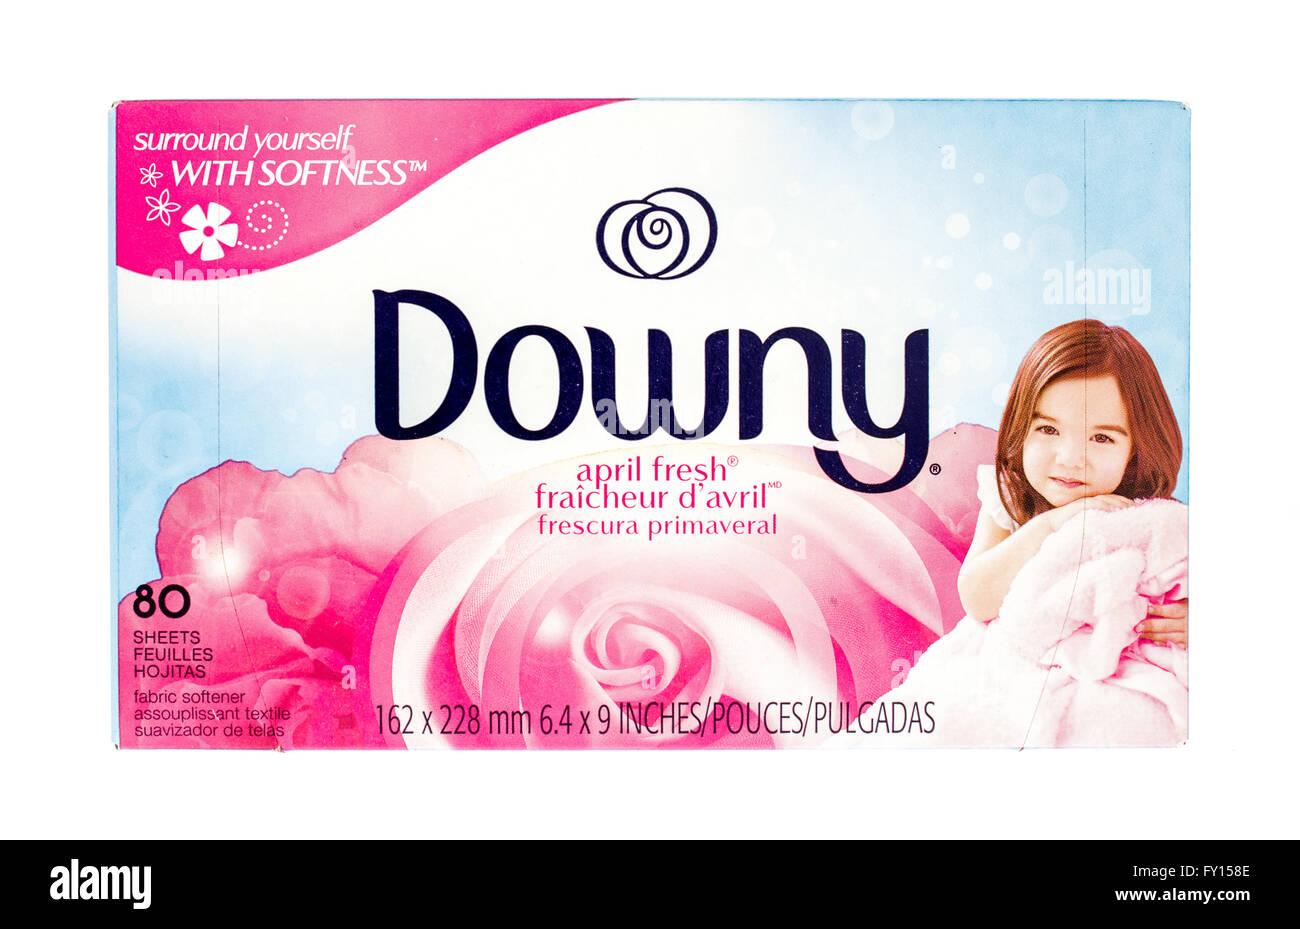 Winneconne, WI -29 Oct 2015: Box of Downy fabric softner sheets. Stock Photo